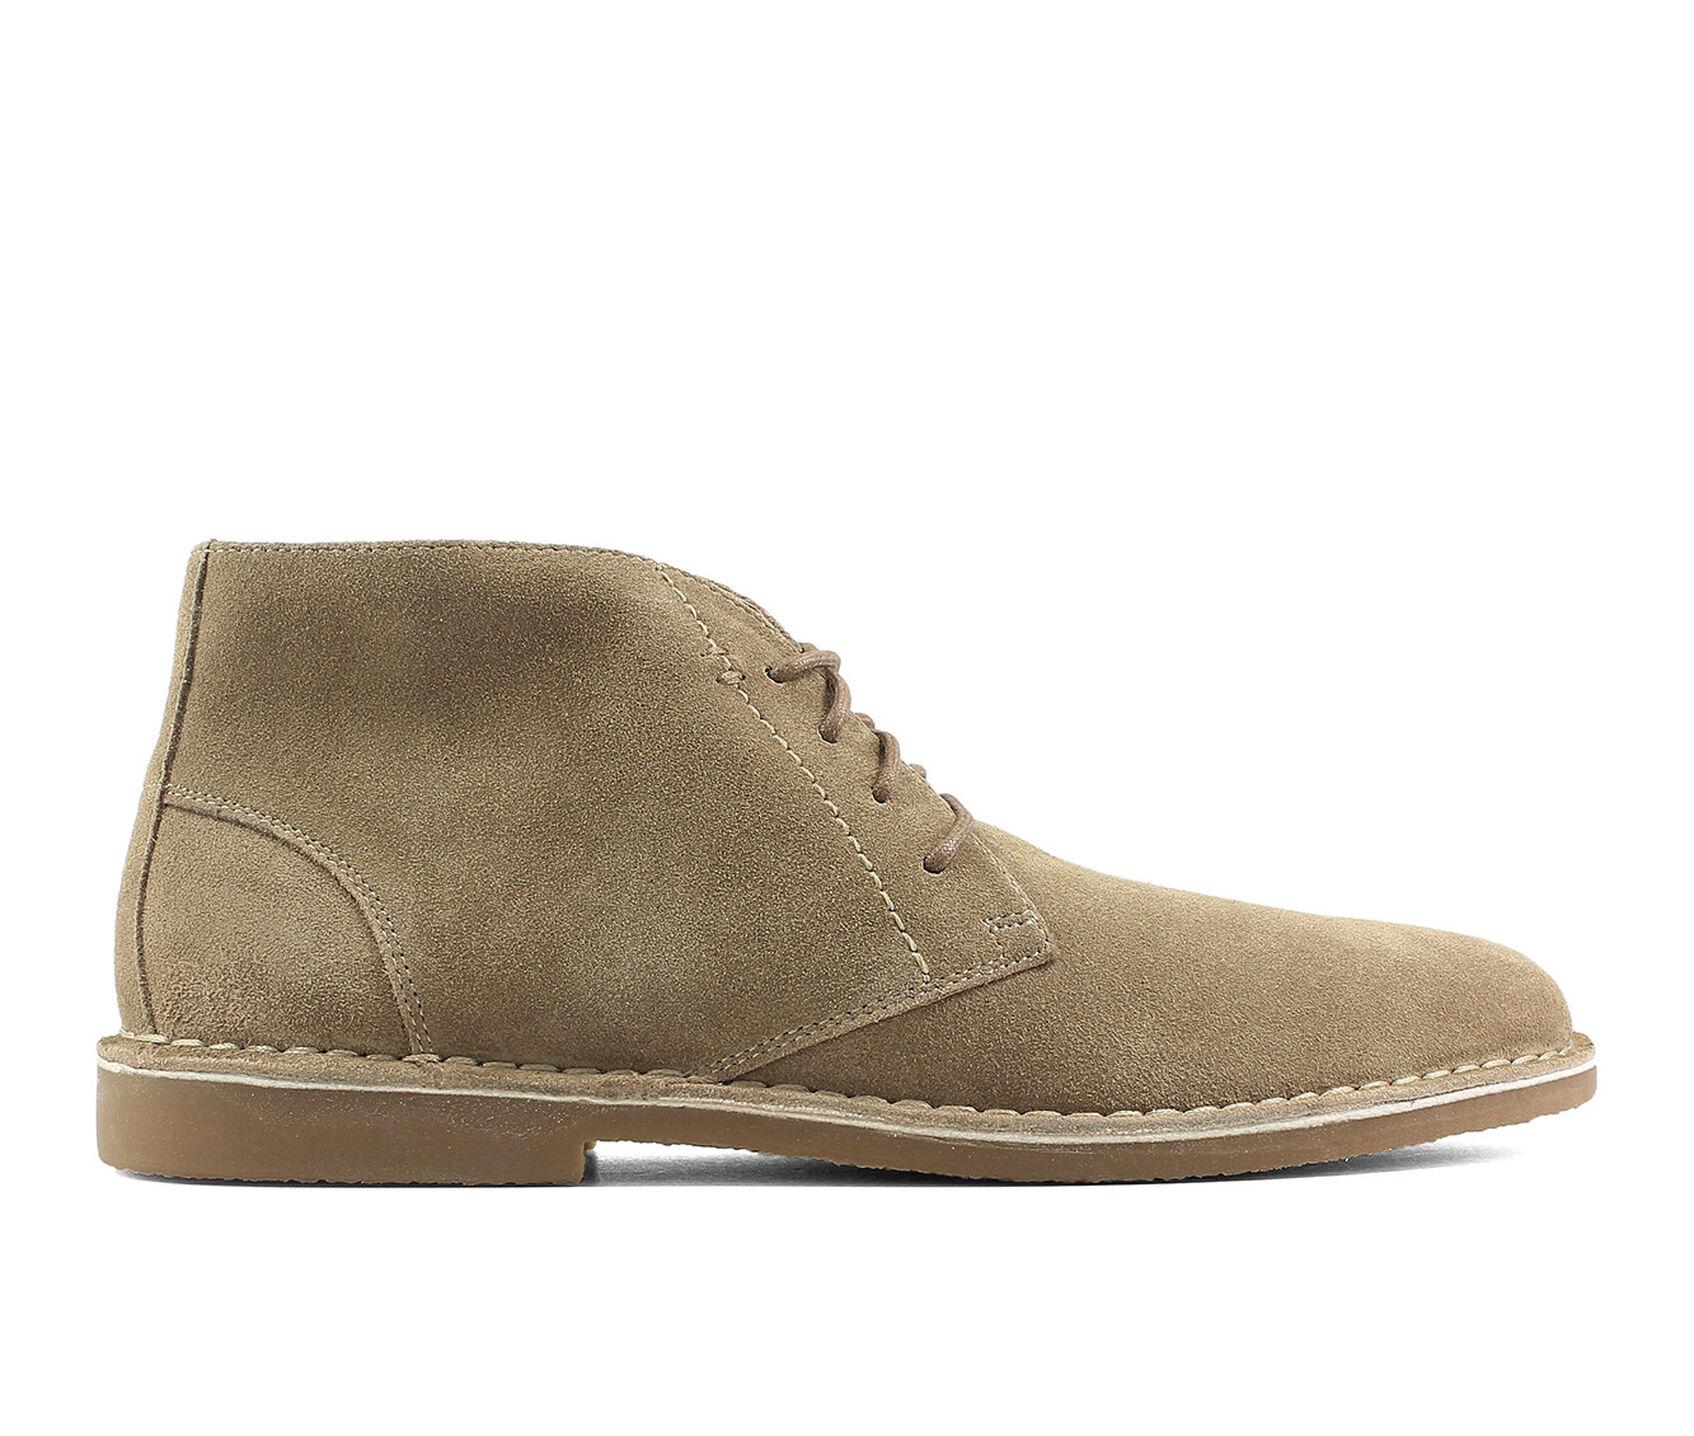 69a308cd323 Men's Nunn Bush Galloway Plain Toe Chukka Boots